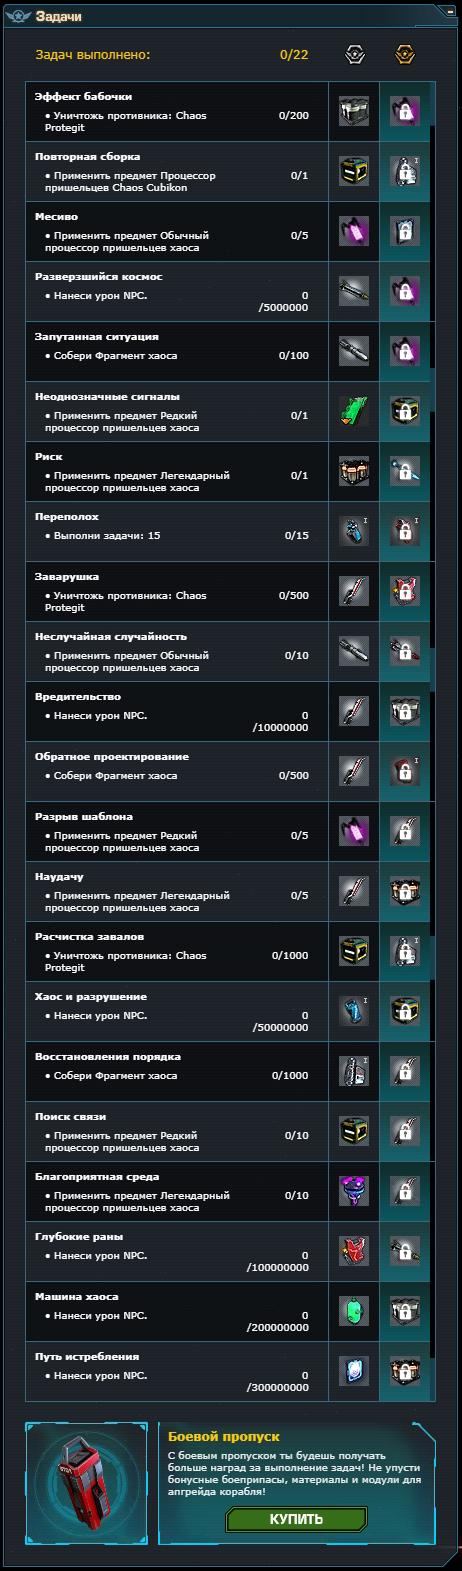 Задачи Переполох Протегитов copy.jpg